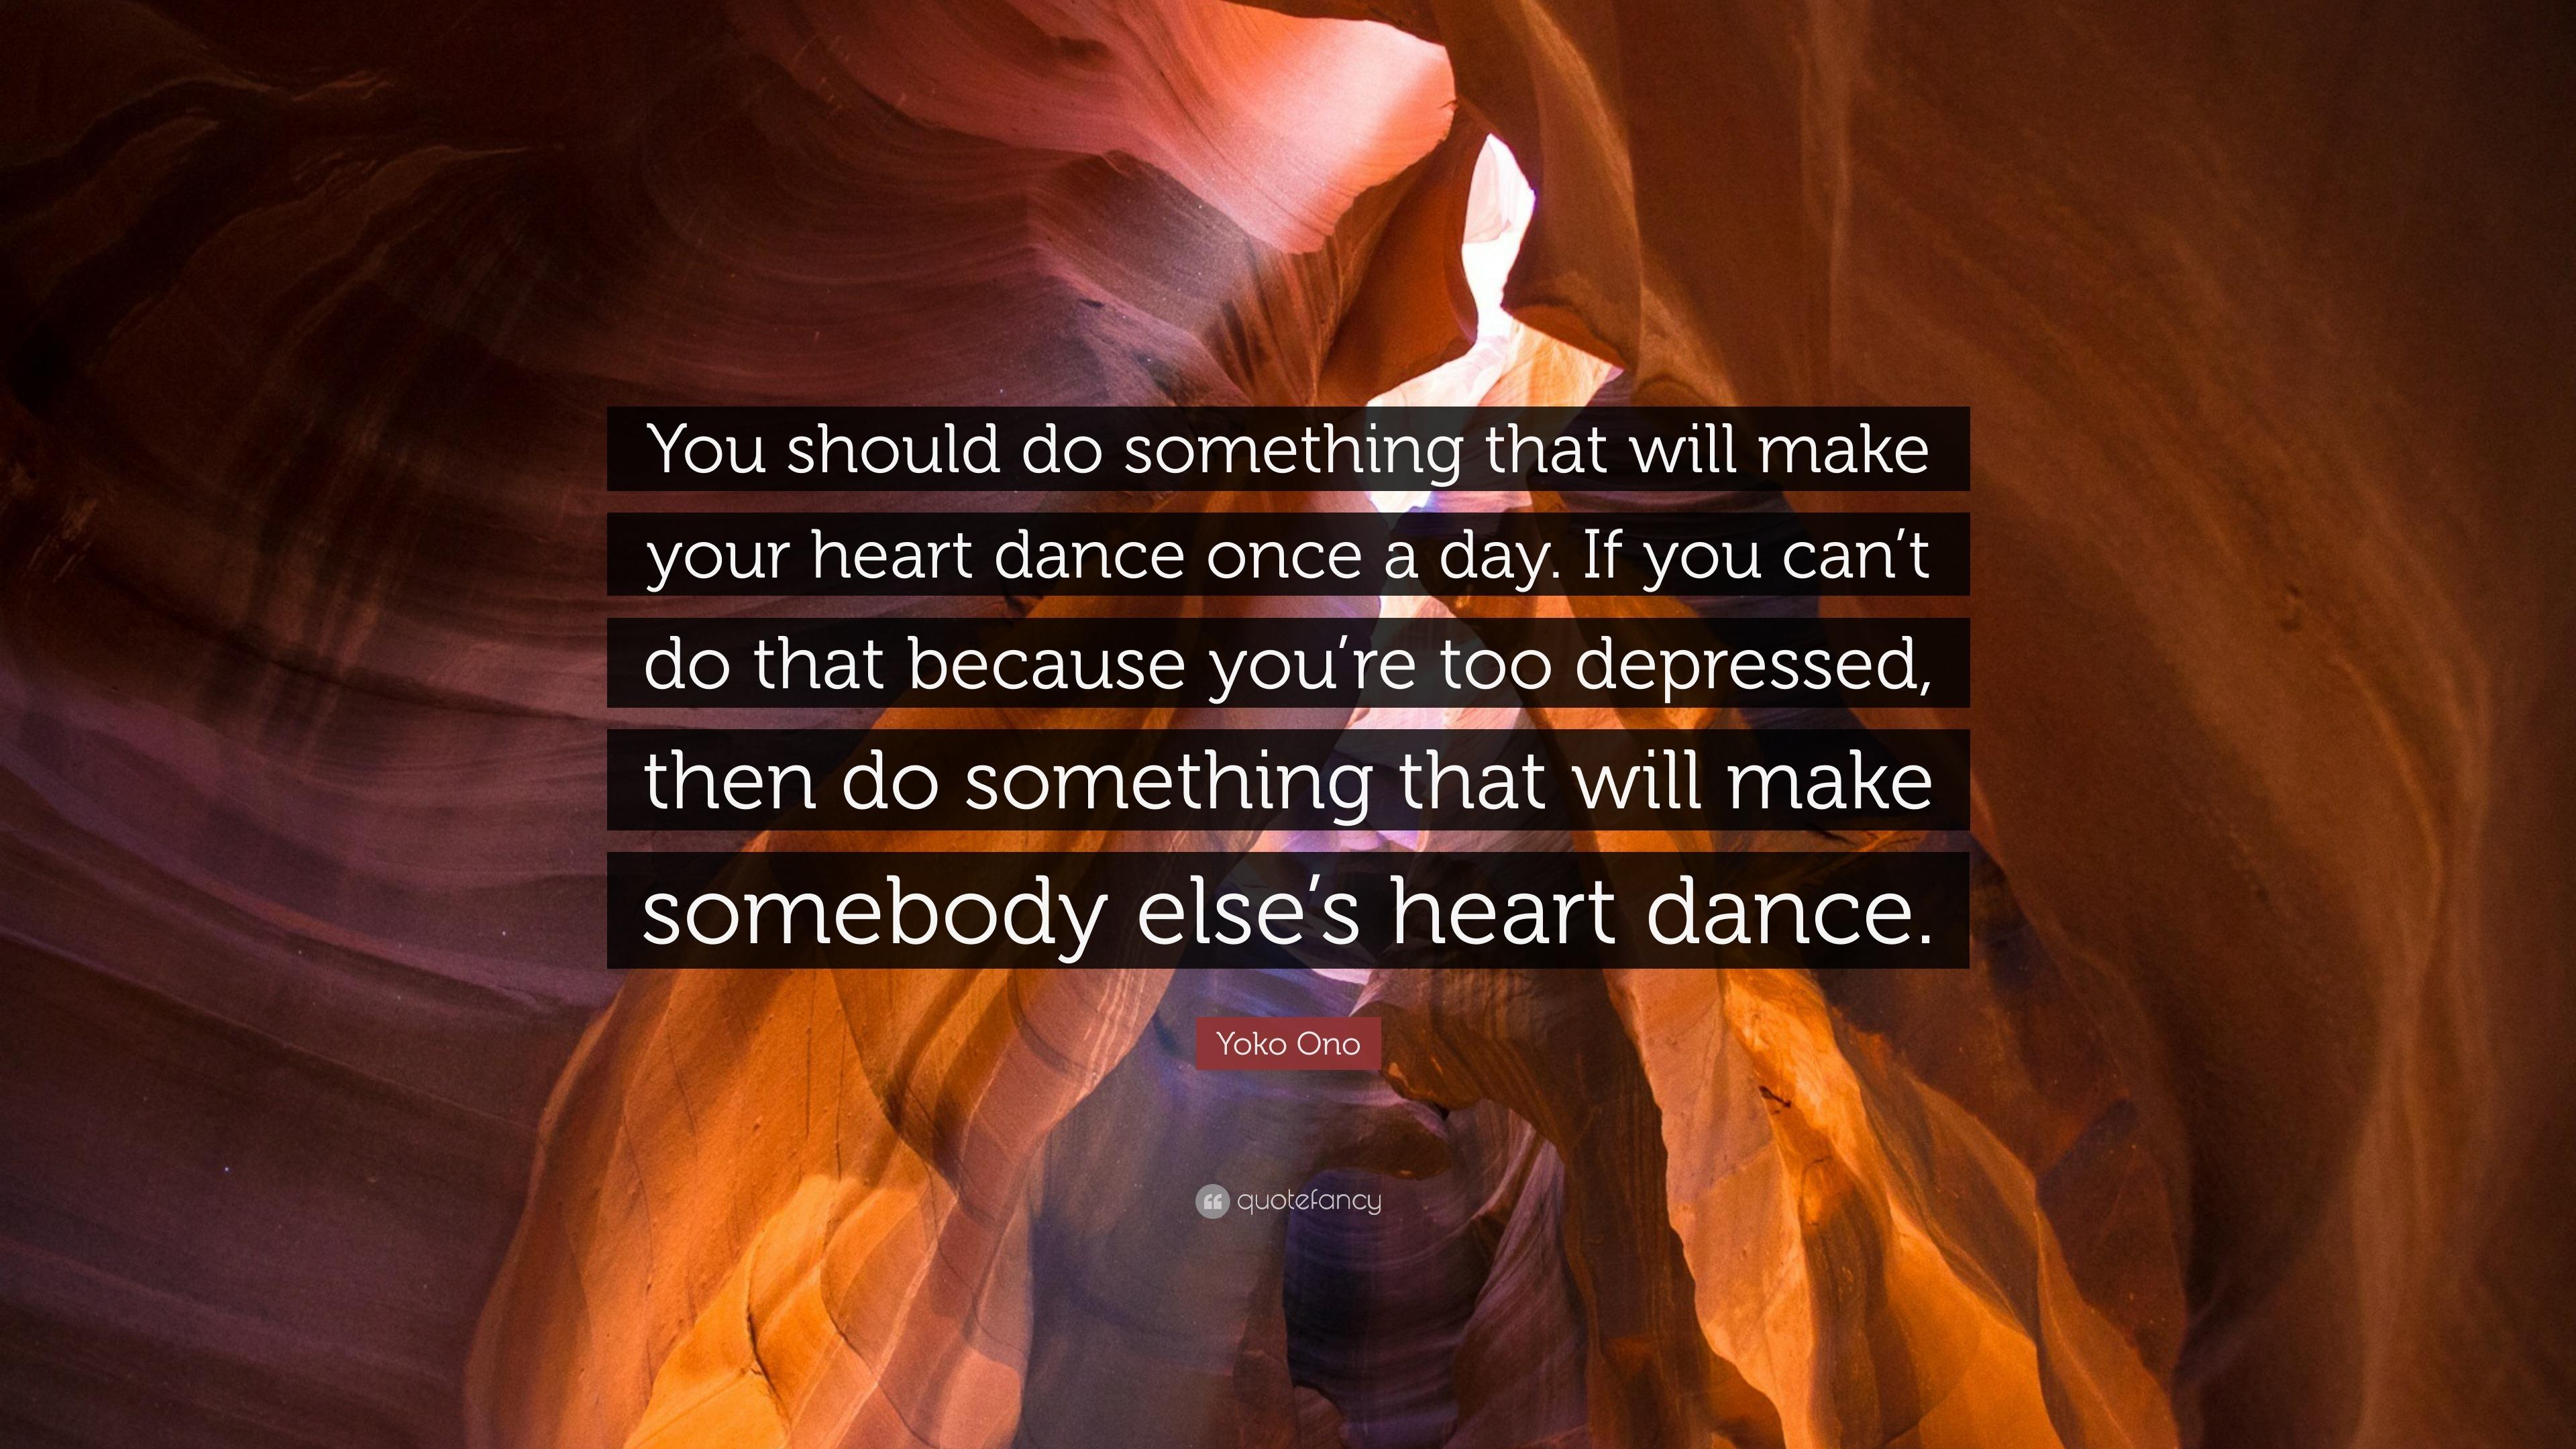 yoko ono quote you should do something that will make your heart yoko ono quote you should do something that will make your heart dance once